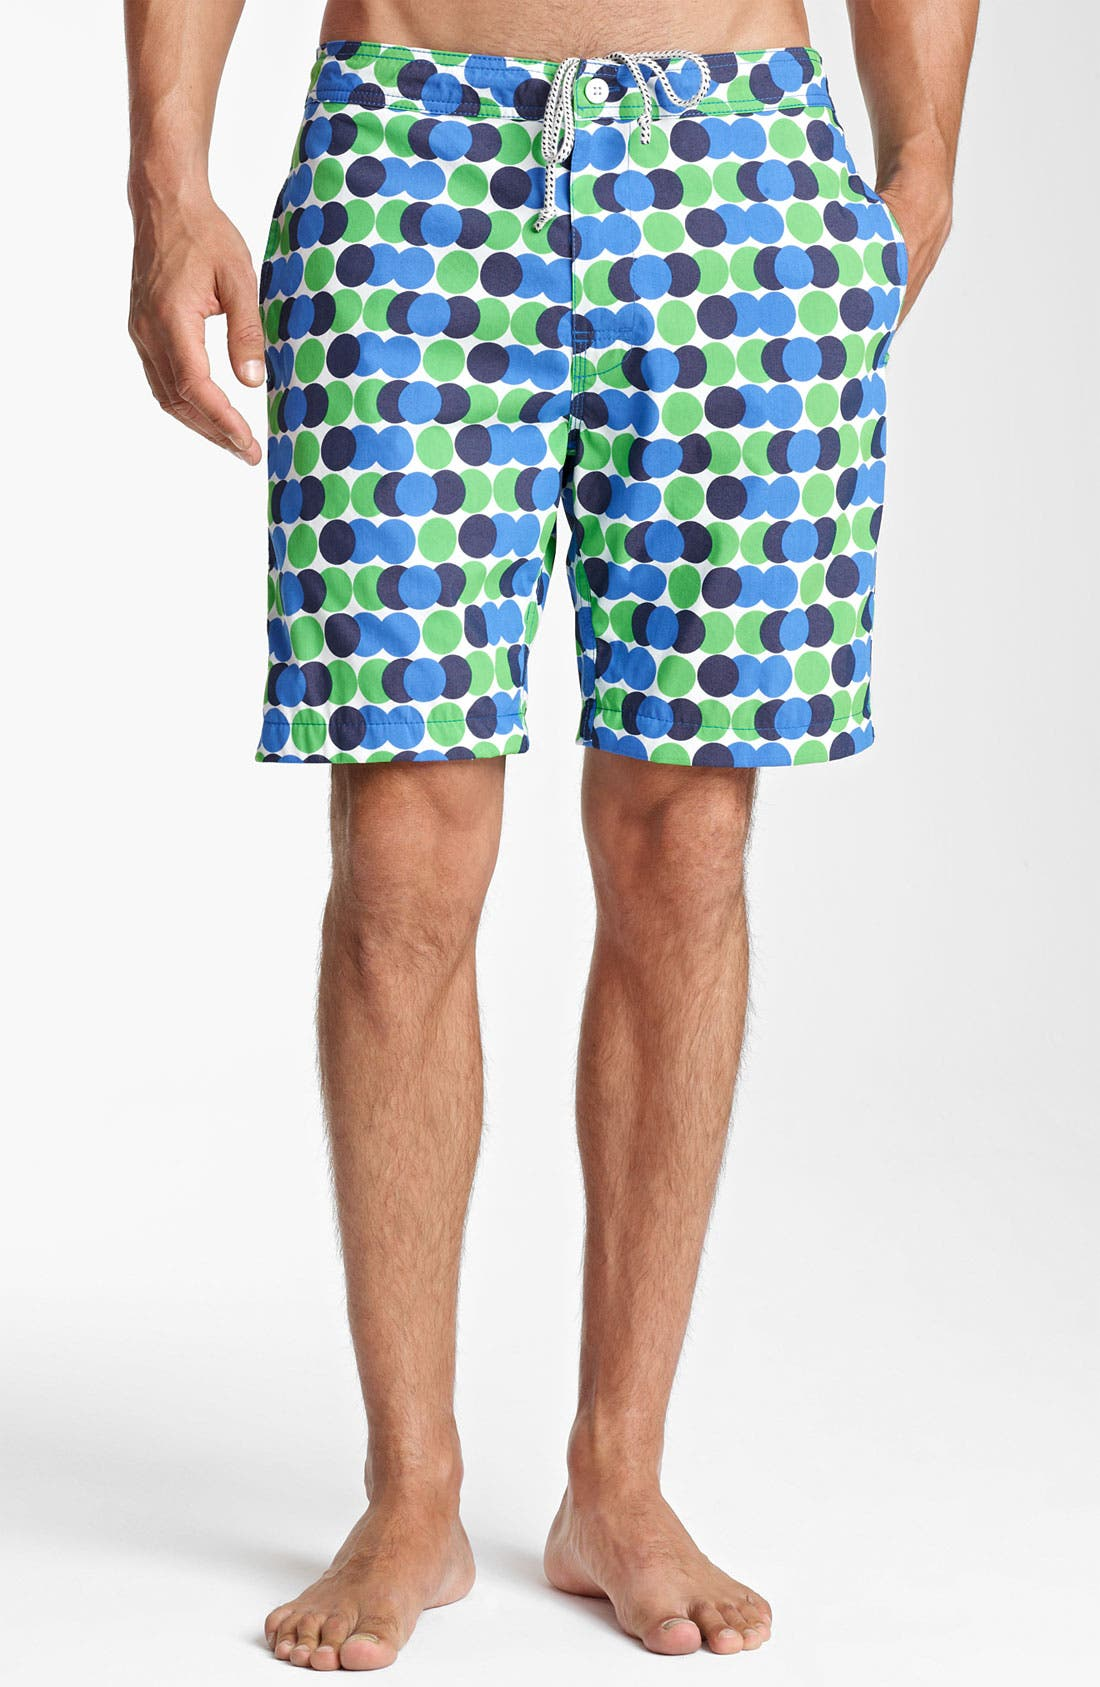 Alternate Image 1 Selected - Jack Spade 'Decker' Dot Board Shorts